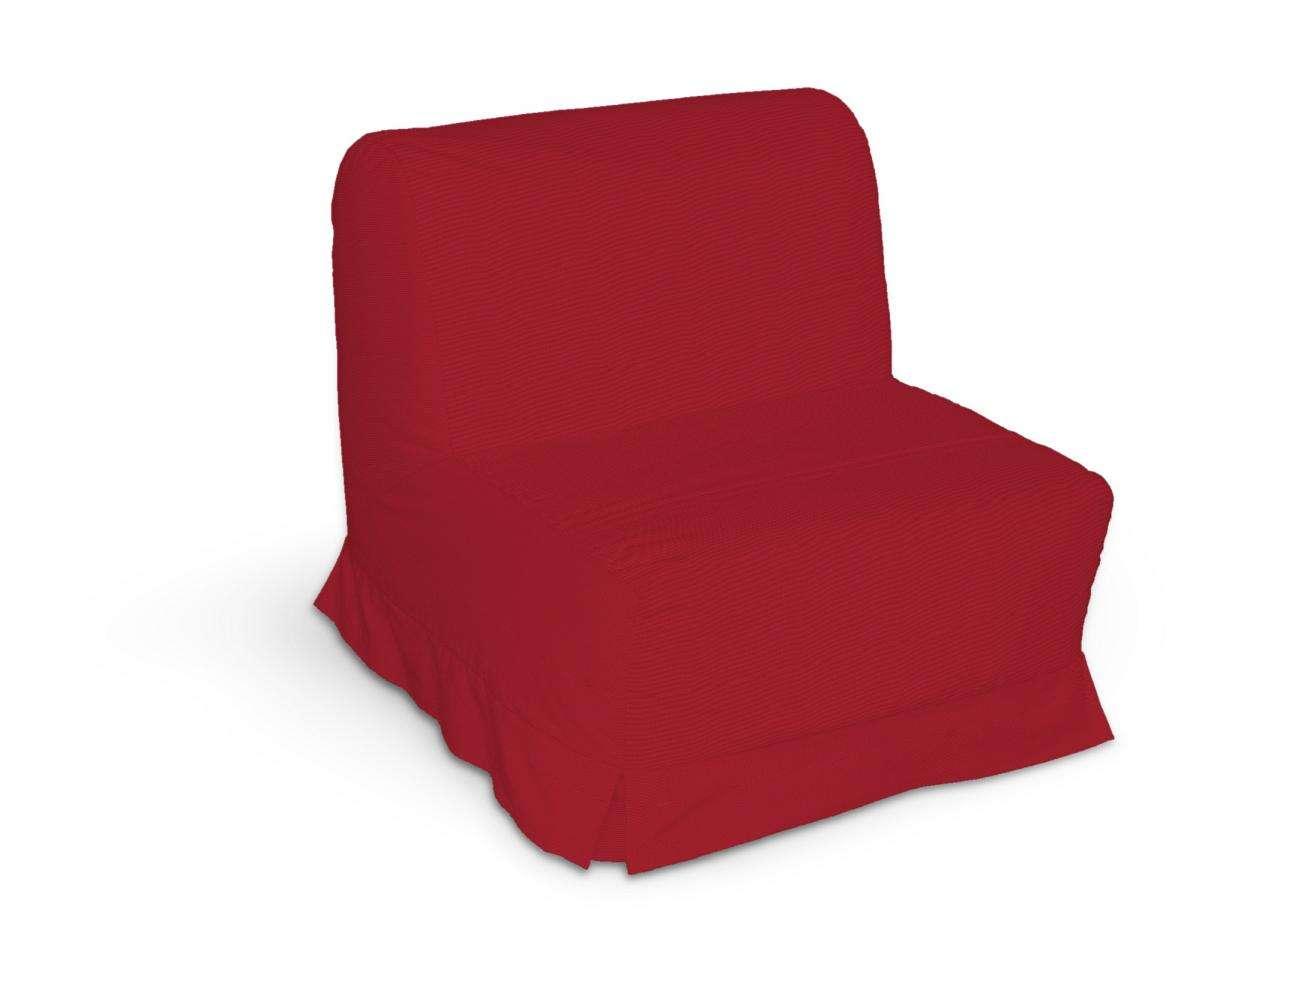 Lycksele Sesselbezug mit Kellerfalten, rot, Lycksele, Etna